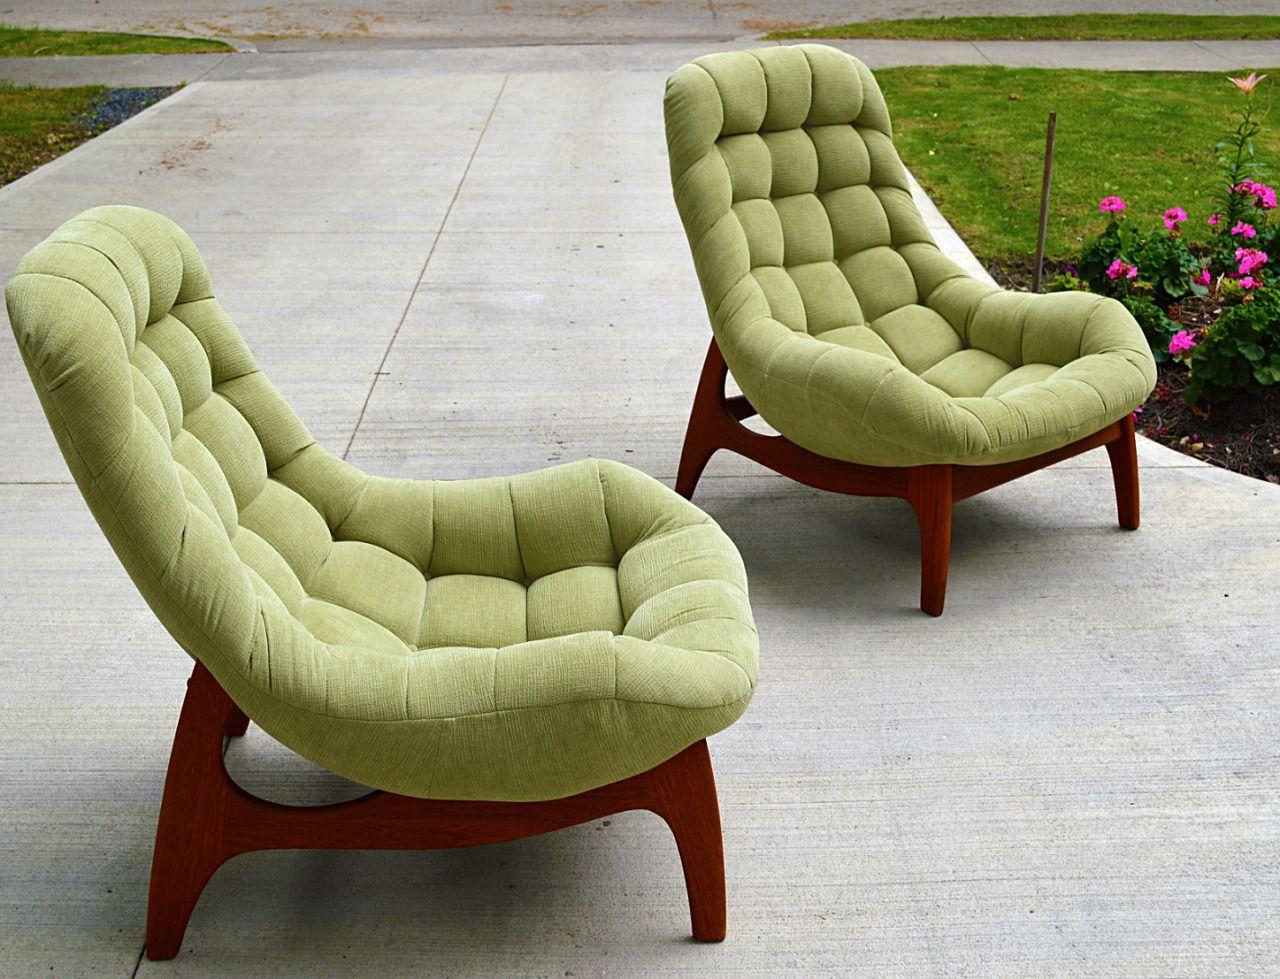 living room lounge chair canada pendant shade 1968 huber chairs r co toronto via